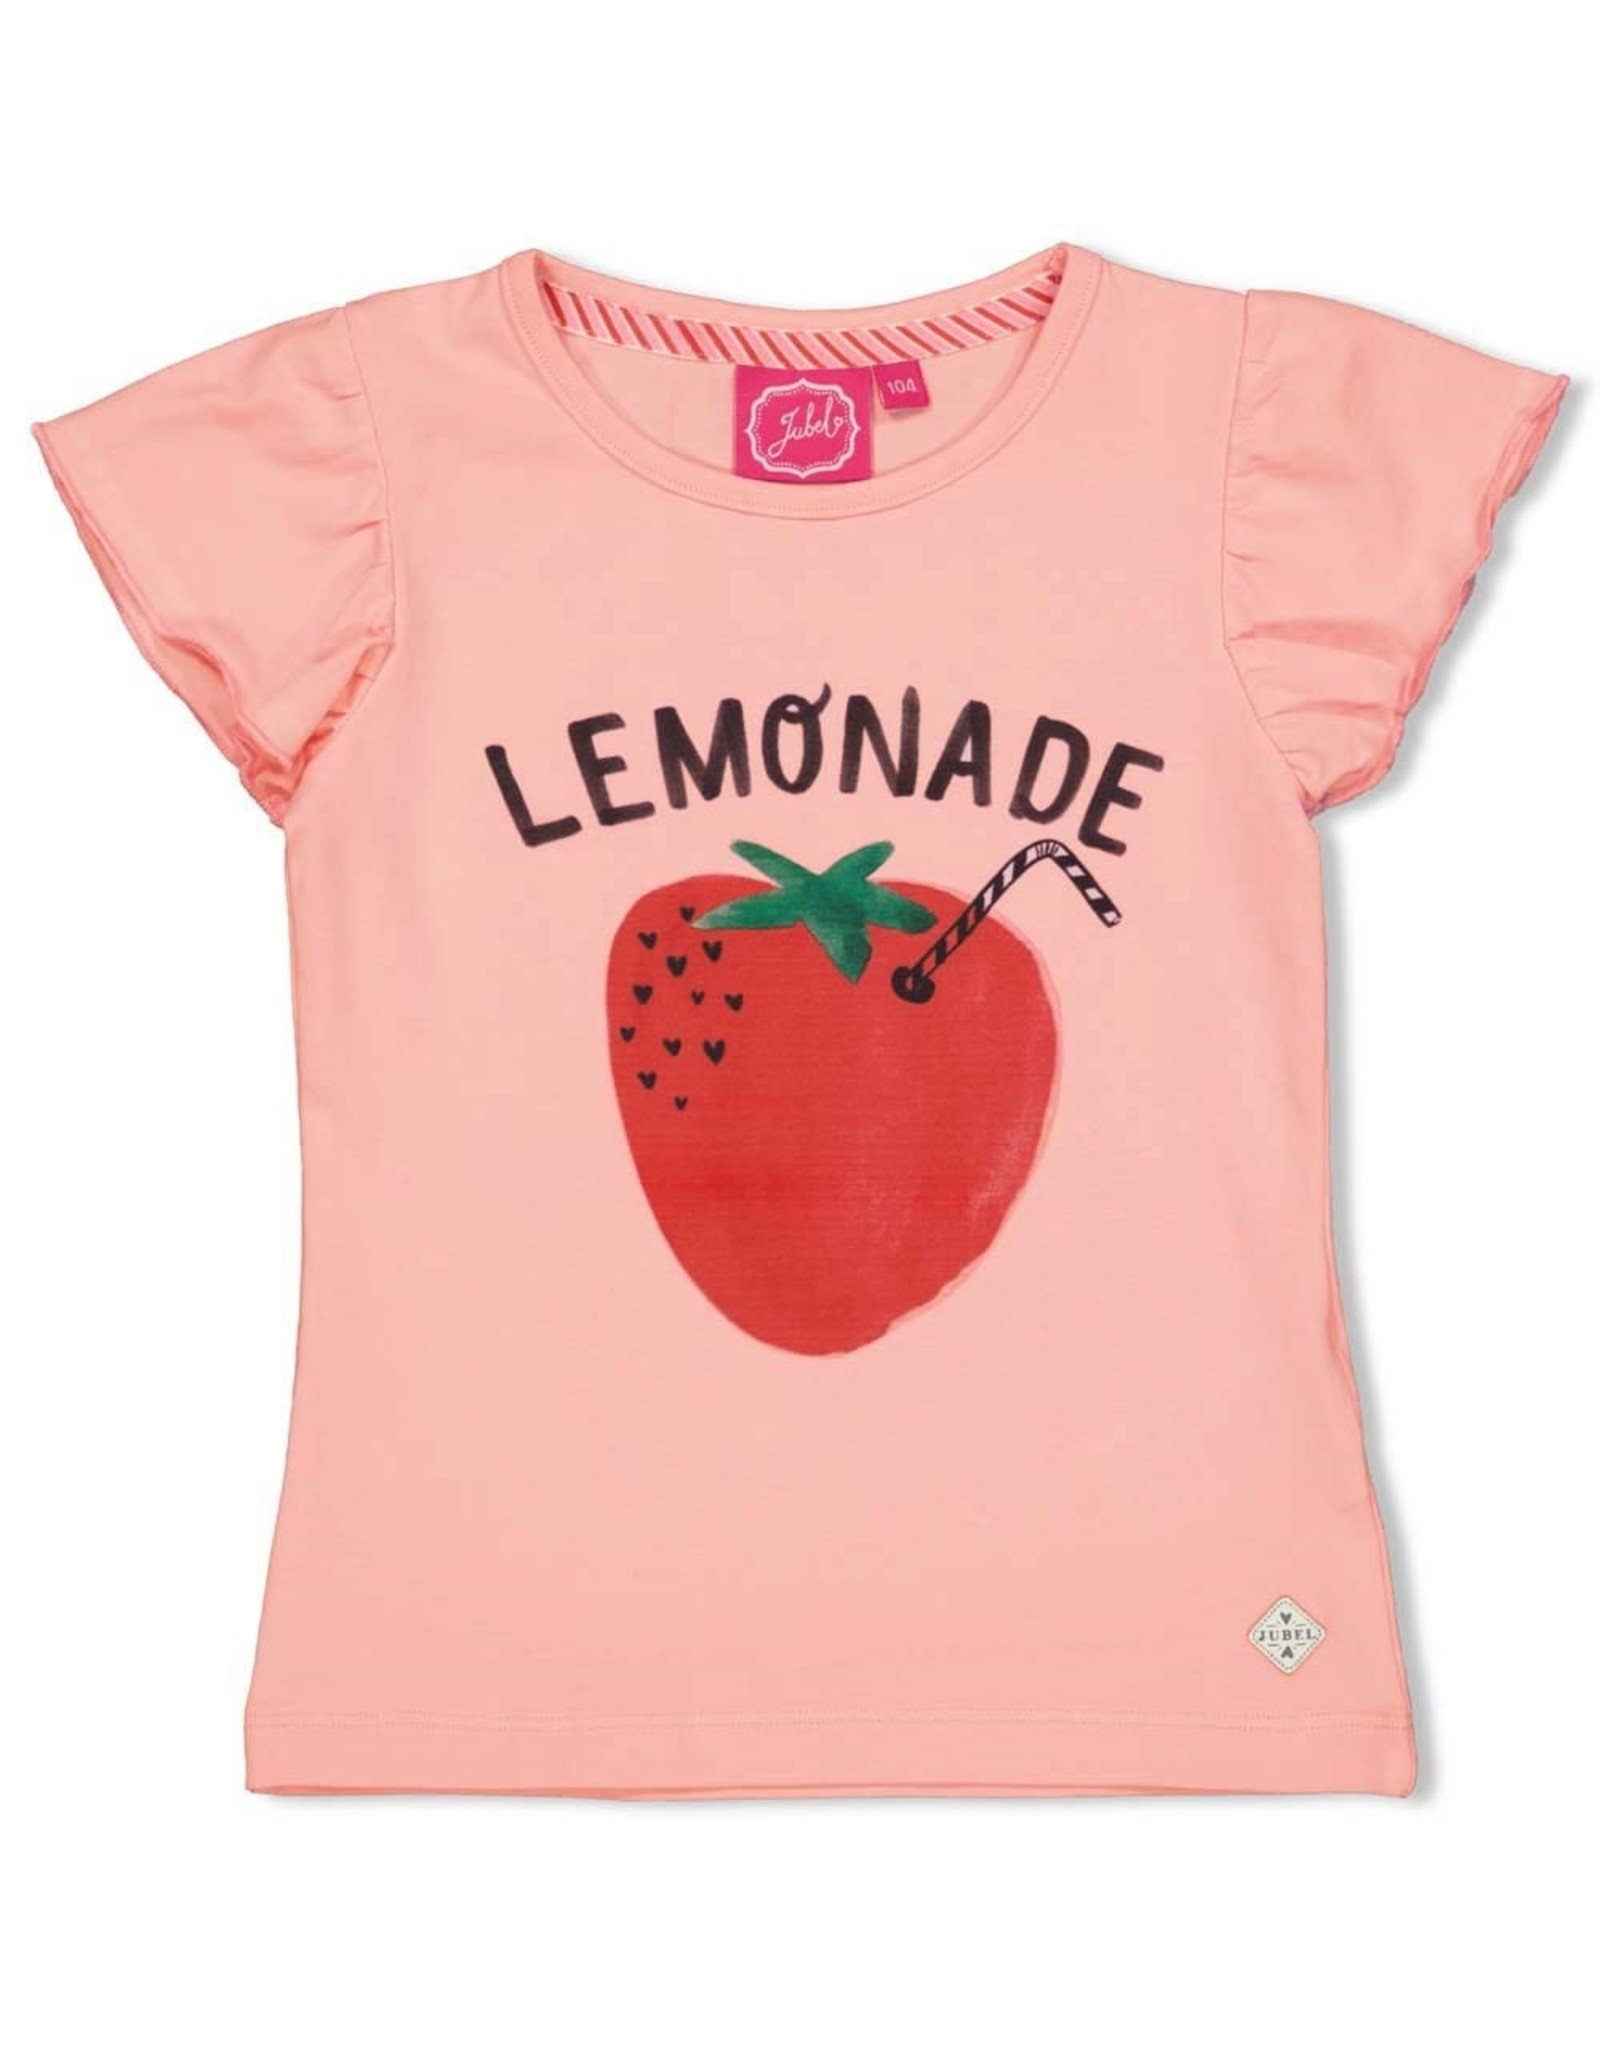 Jubel T-shirt Lemonade roze - Tutti Frutti